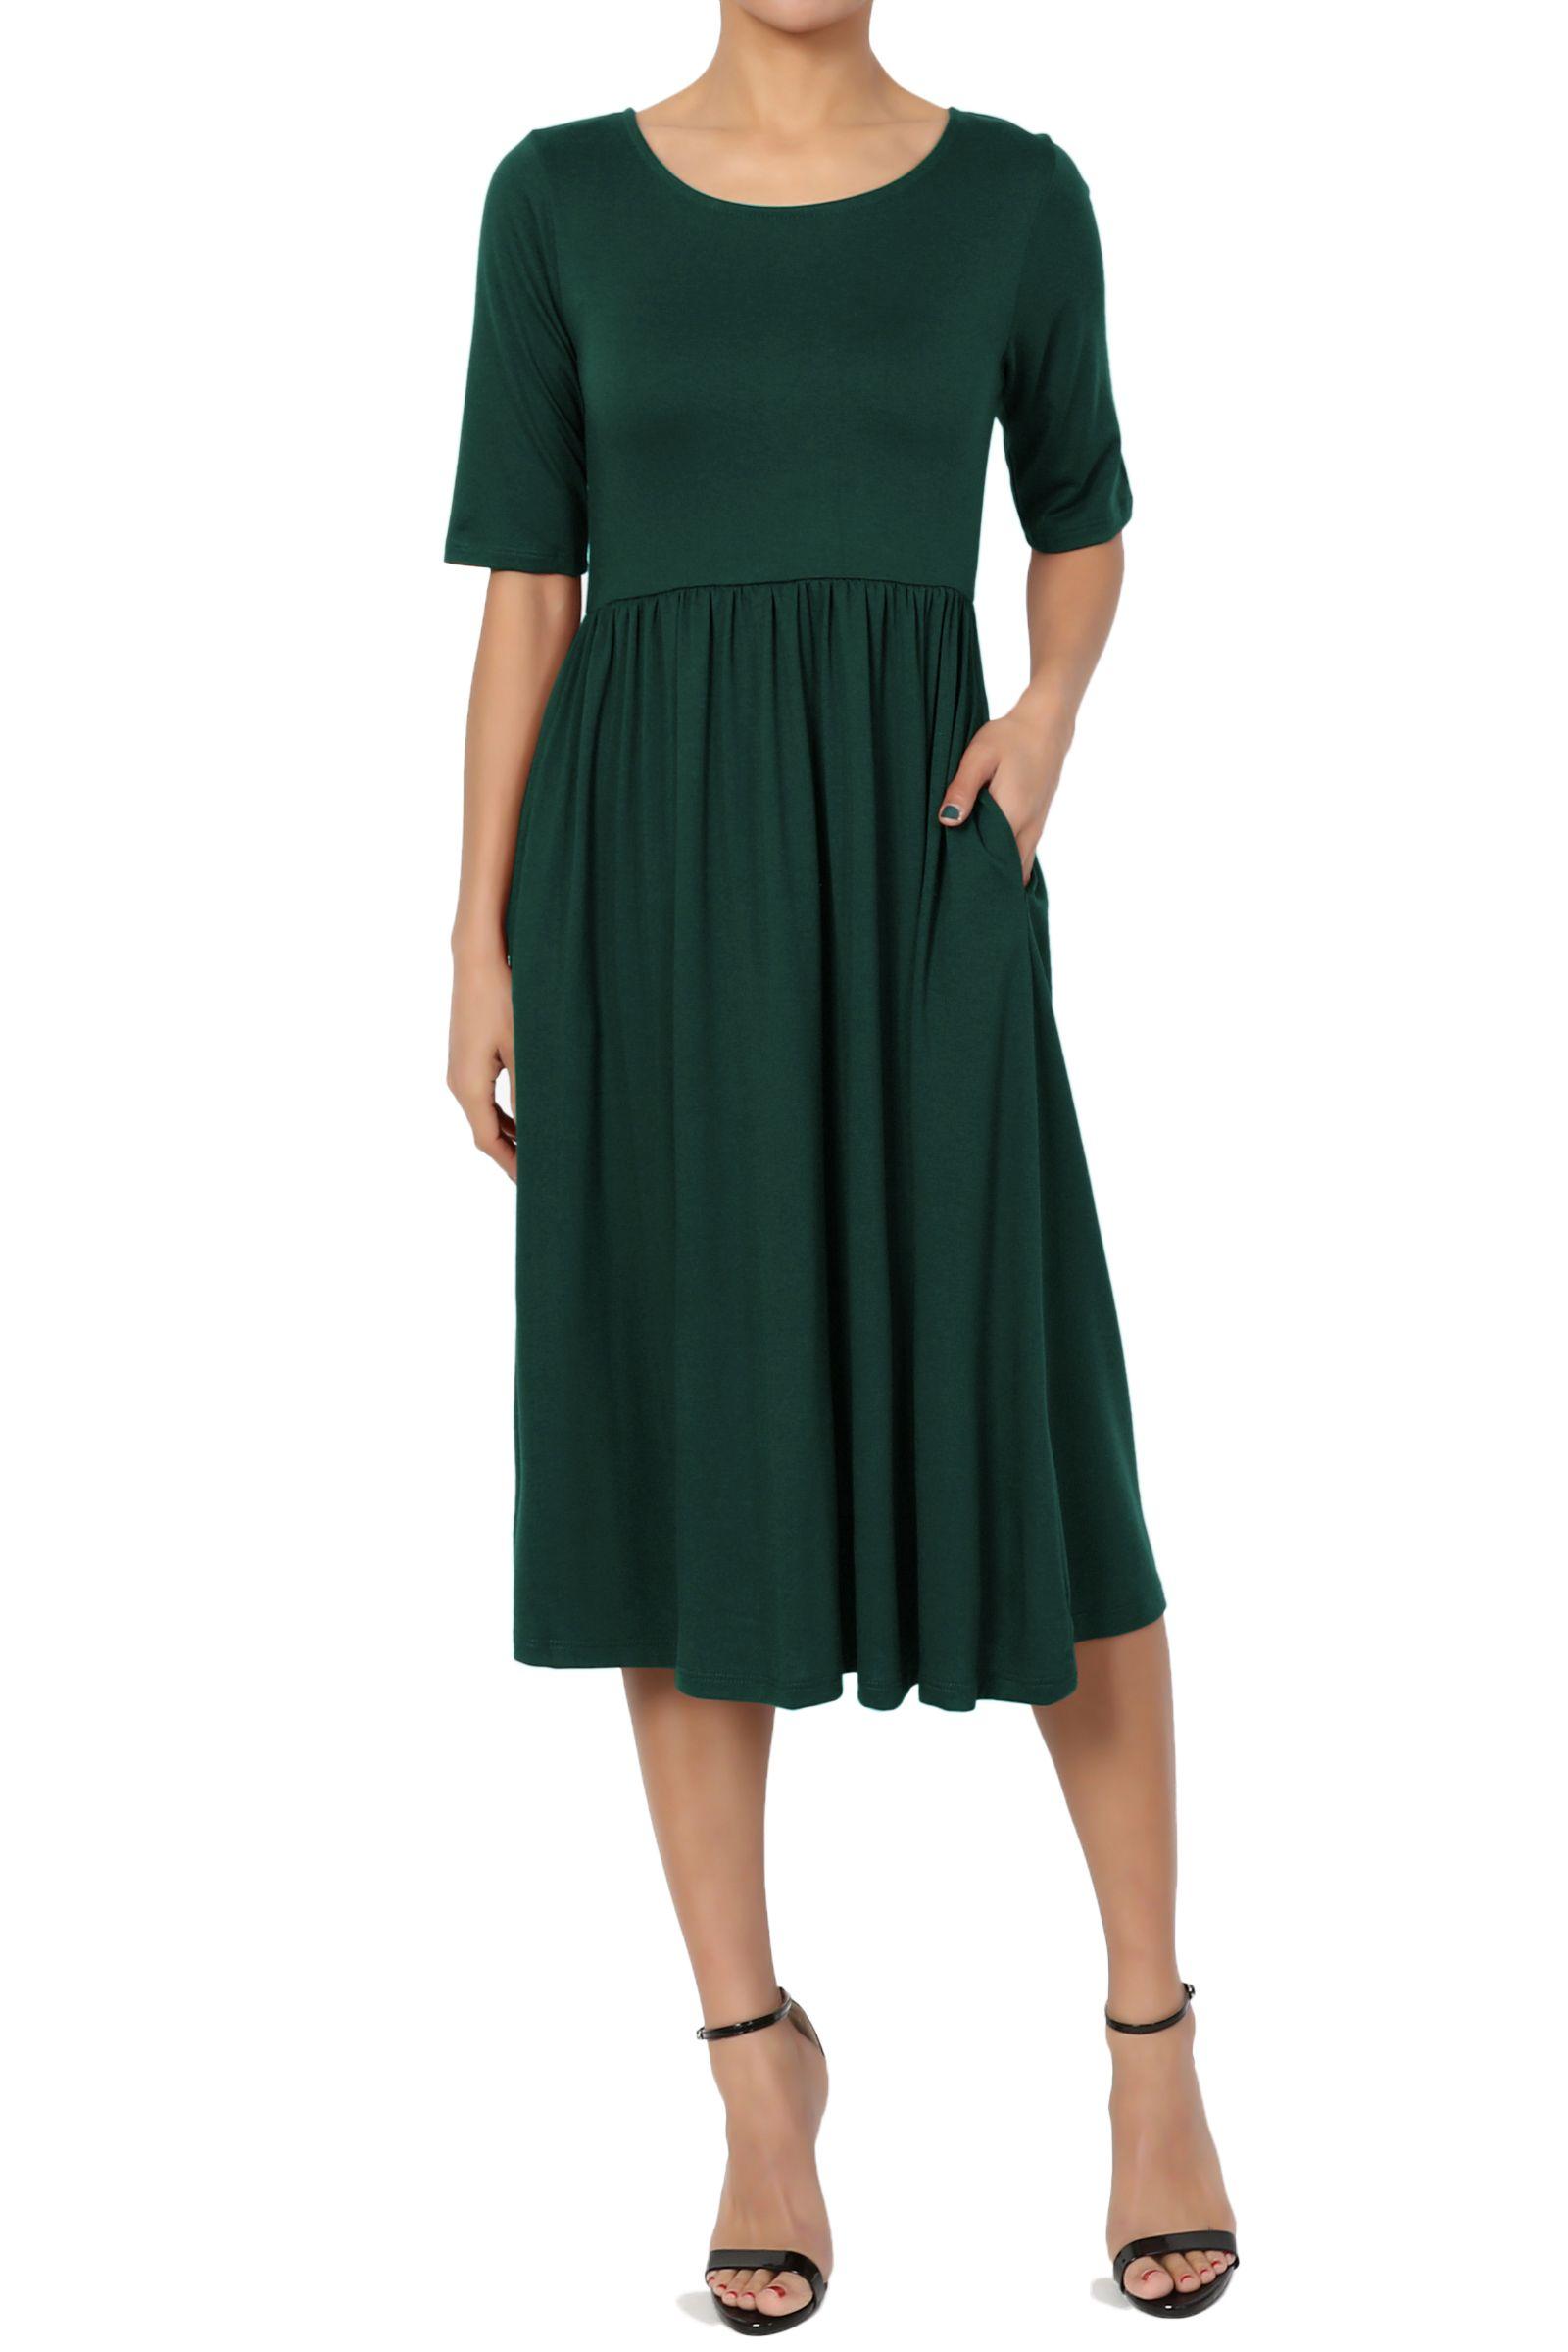 Themogan Themogan Women S 1 2 Short Sleeve Pleated Empire Waist Fit Flare Pocket Dress Walmart Com Dressy Cocktail Dress Short Strapless Prom Dresses Pocket Dress [ 2400 x 1600 Pixel ]